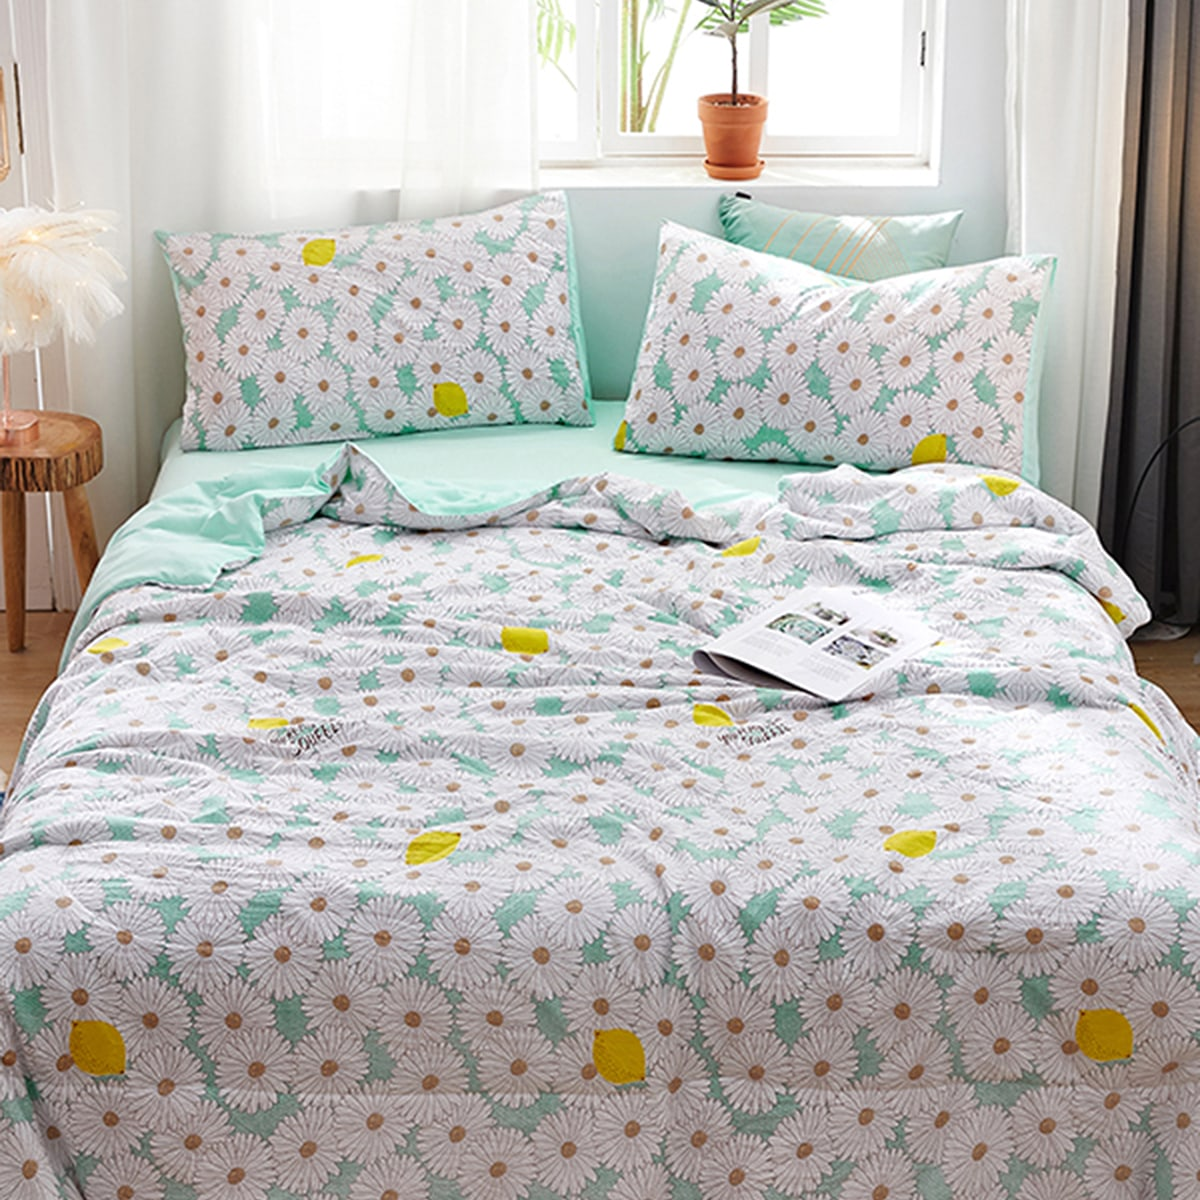 Daisy Print Summer Quilt